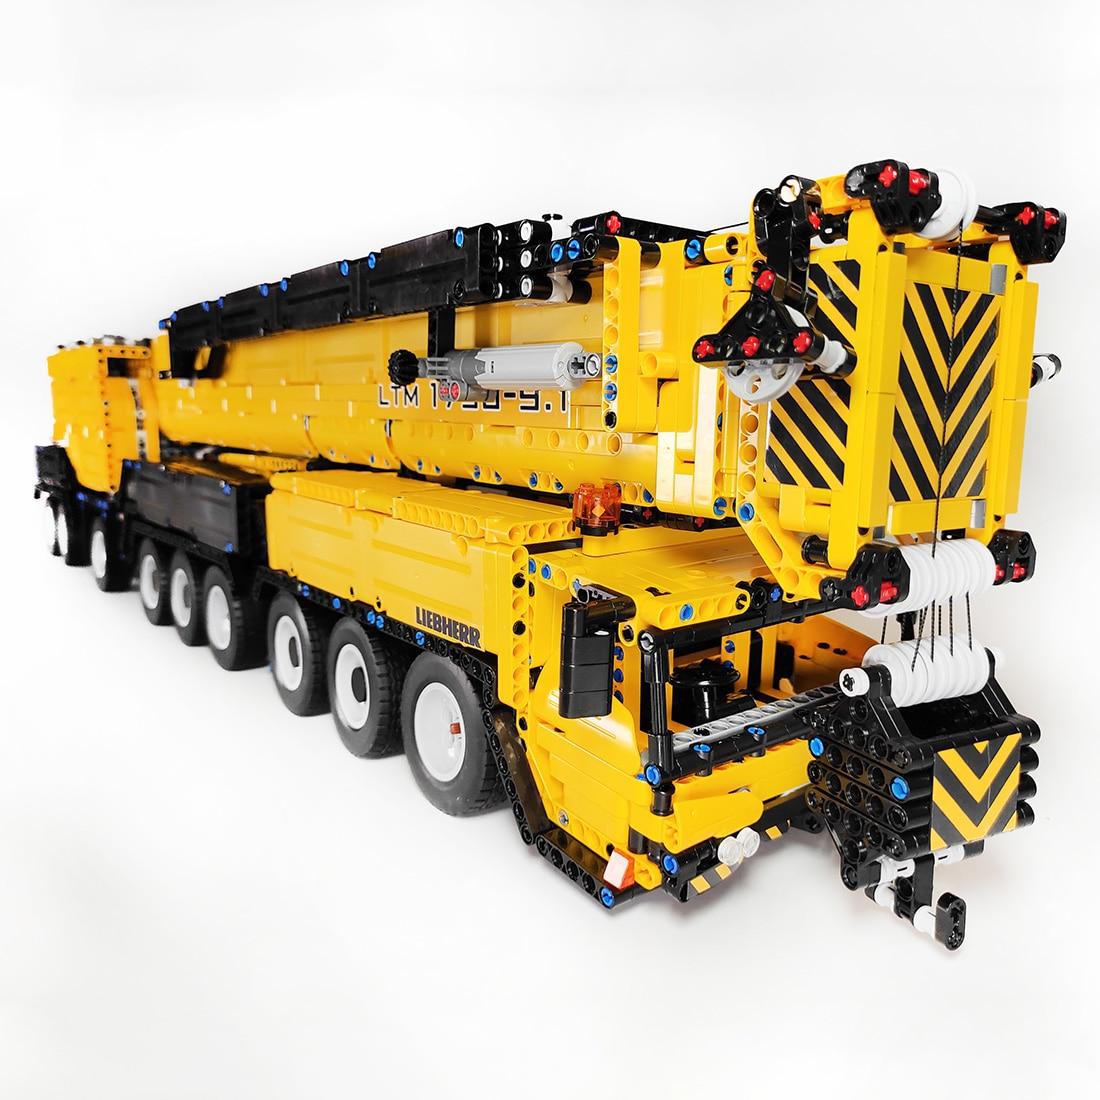 7668Pcs DIY Moc Small Particles 1:20 2.4G RC Mobile All-terrain Crane LTM1750-9.1 Building Blocks Construction Vehicle Kit